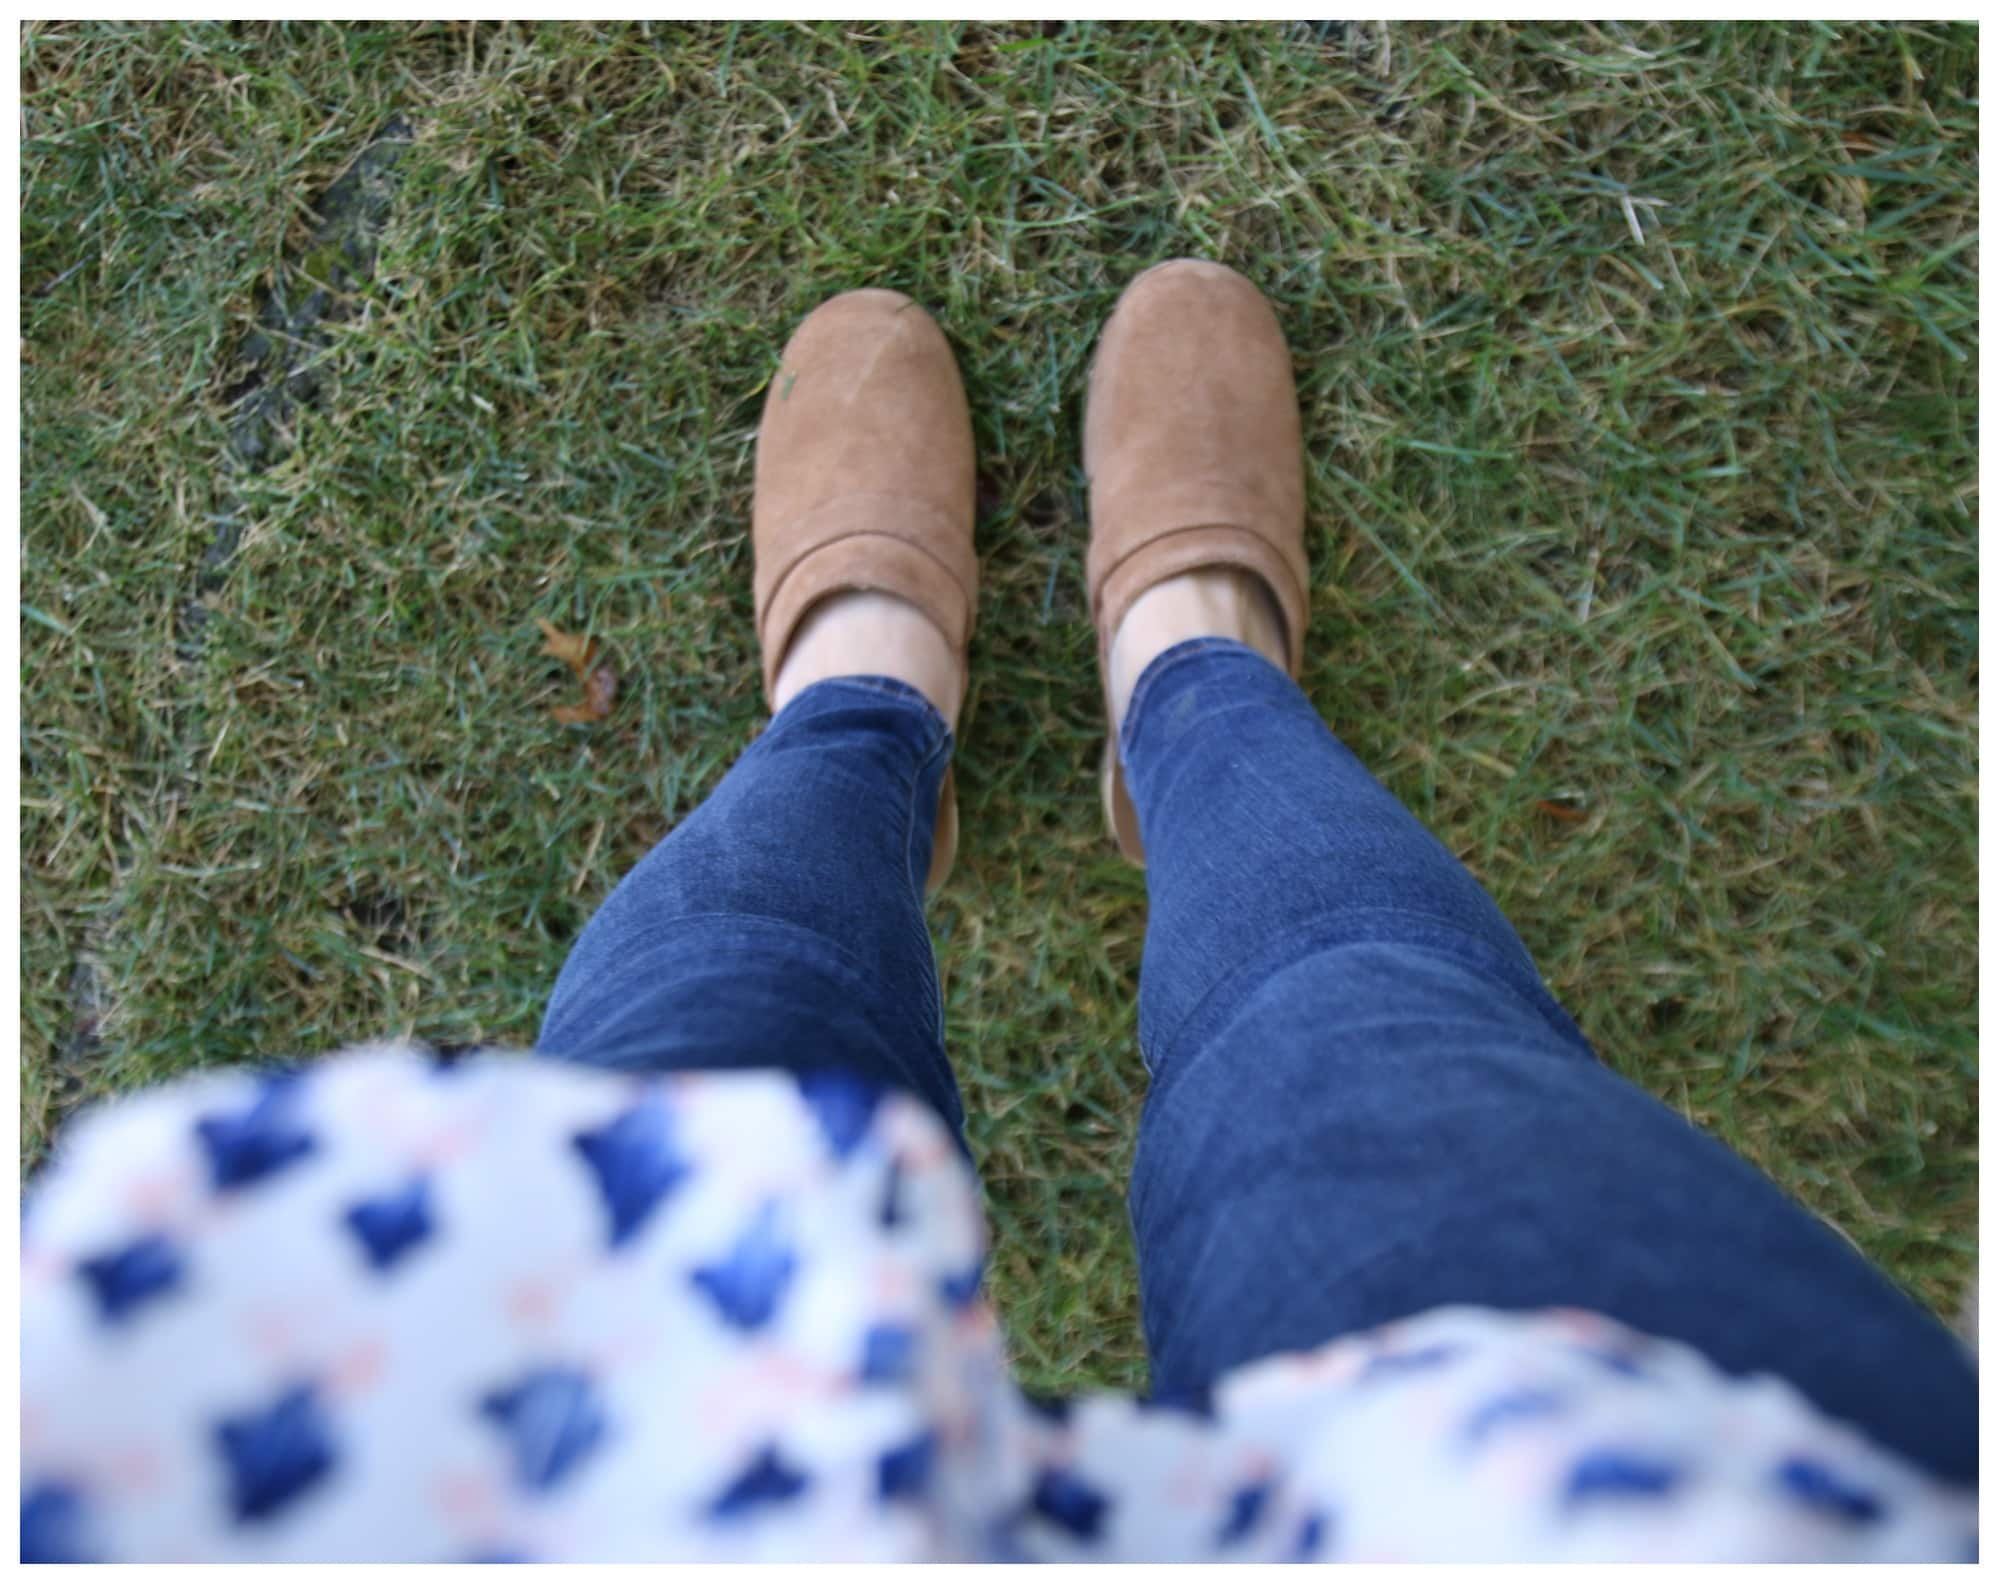 Sarah Clogs From Crocs: Shoe Fashion Review Plus 20% Coupon Code!